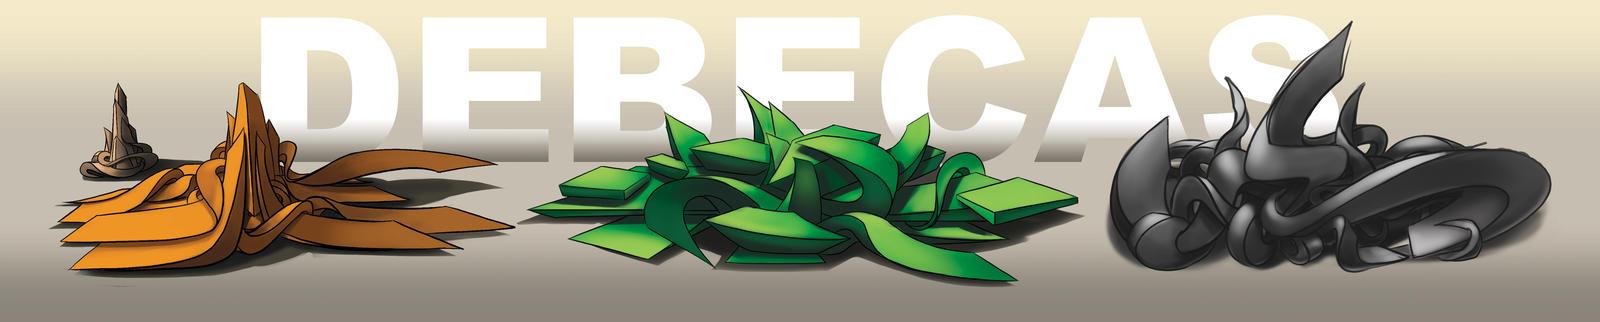 graffiti digital 3d  Debecas by Debecas